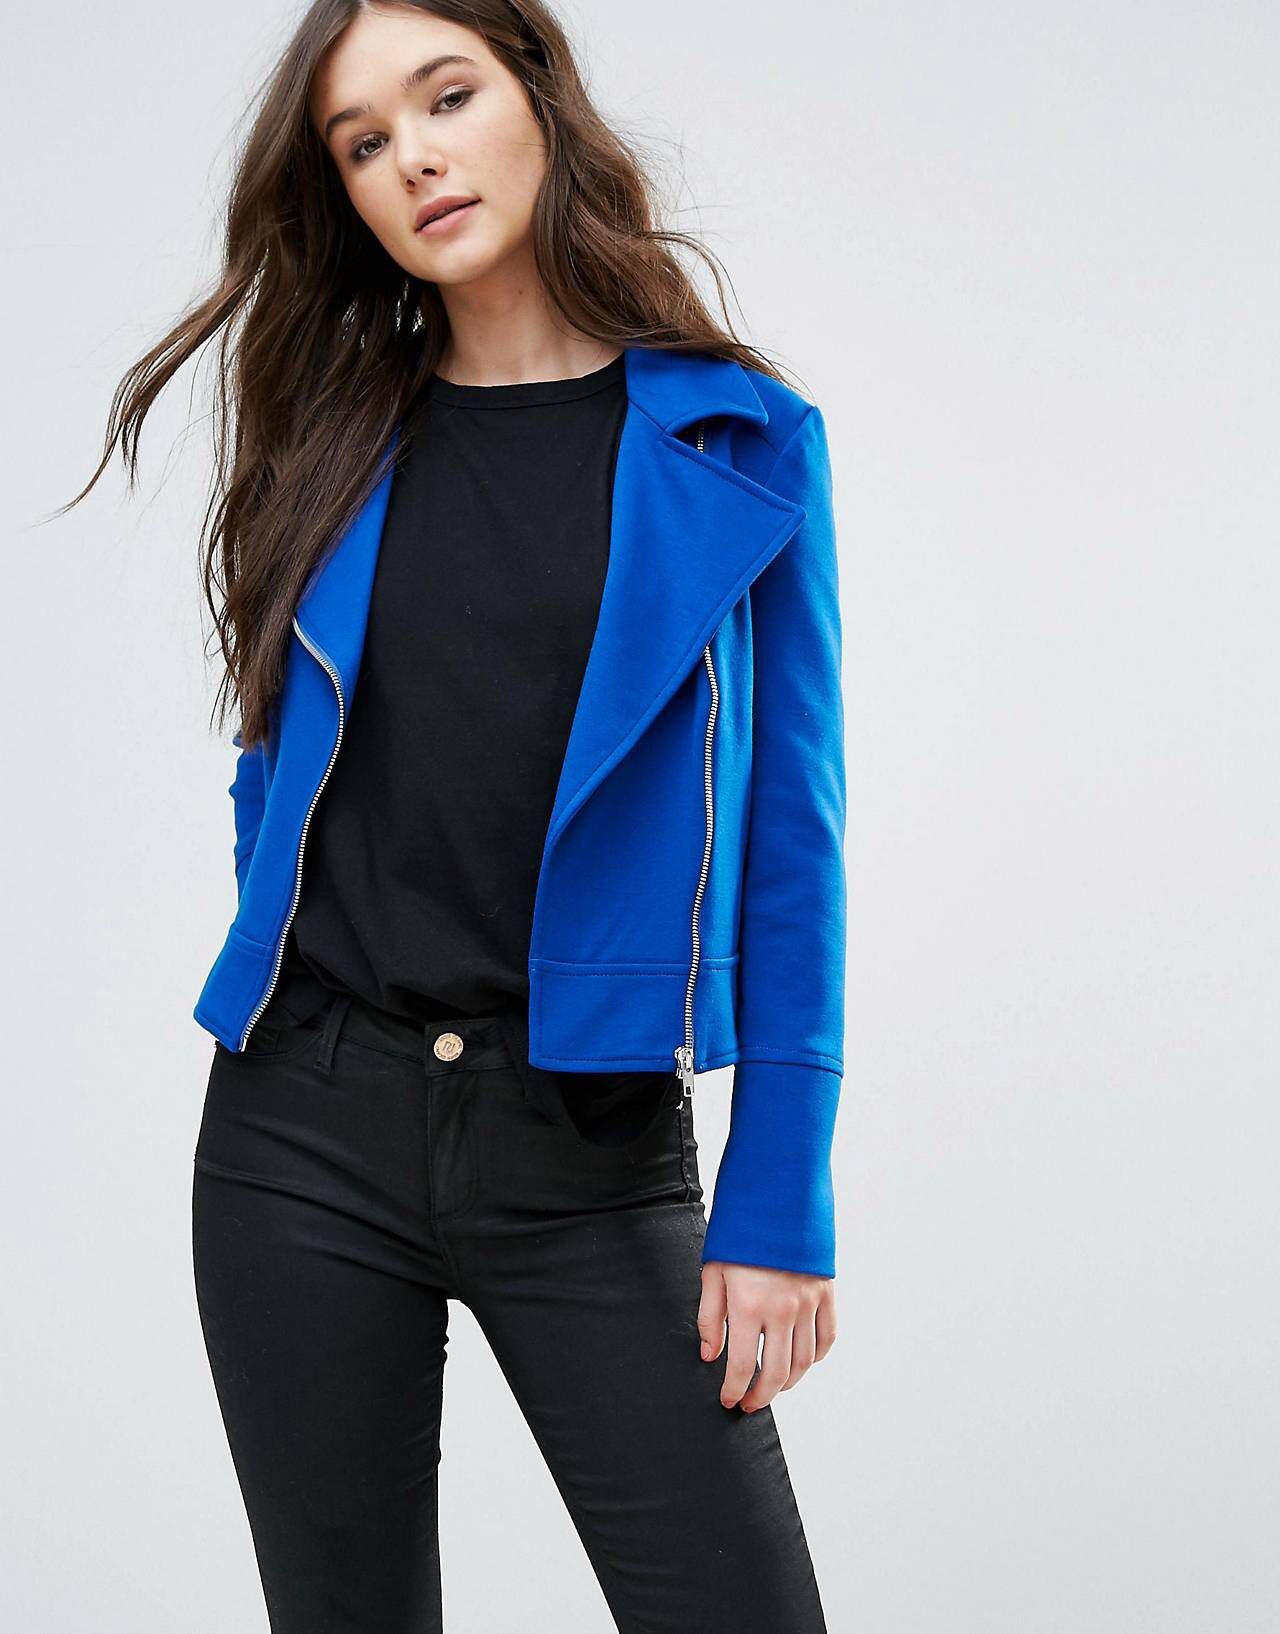 Pin by MEI LAN on Things to Wear in 2019 Latest fashion